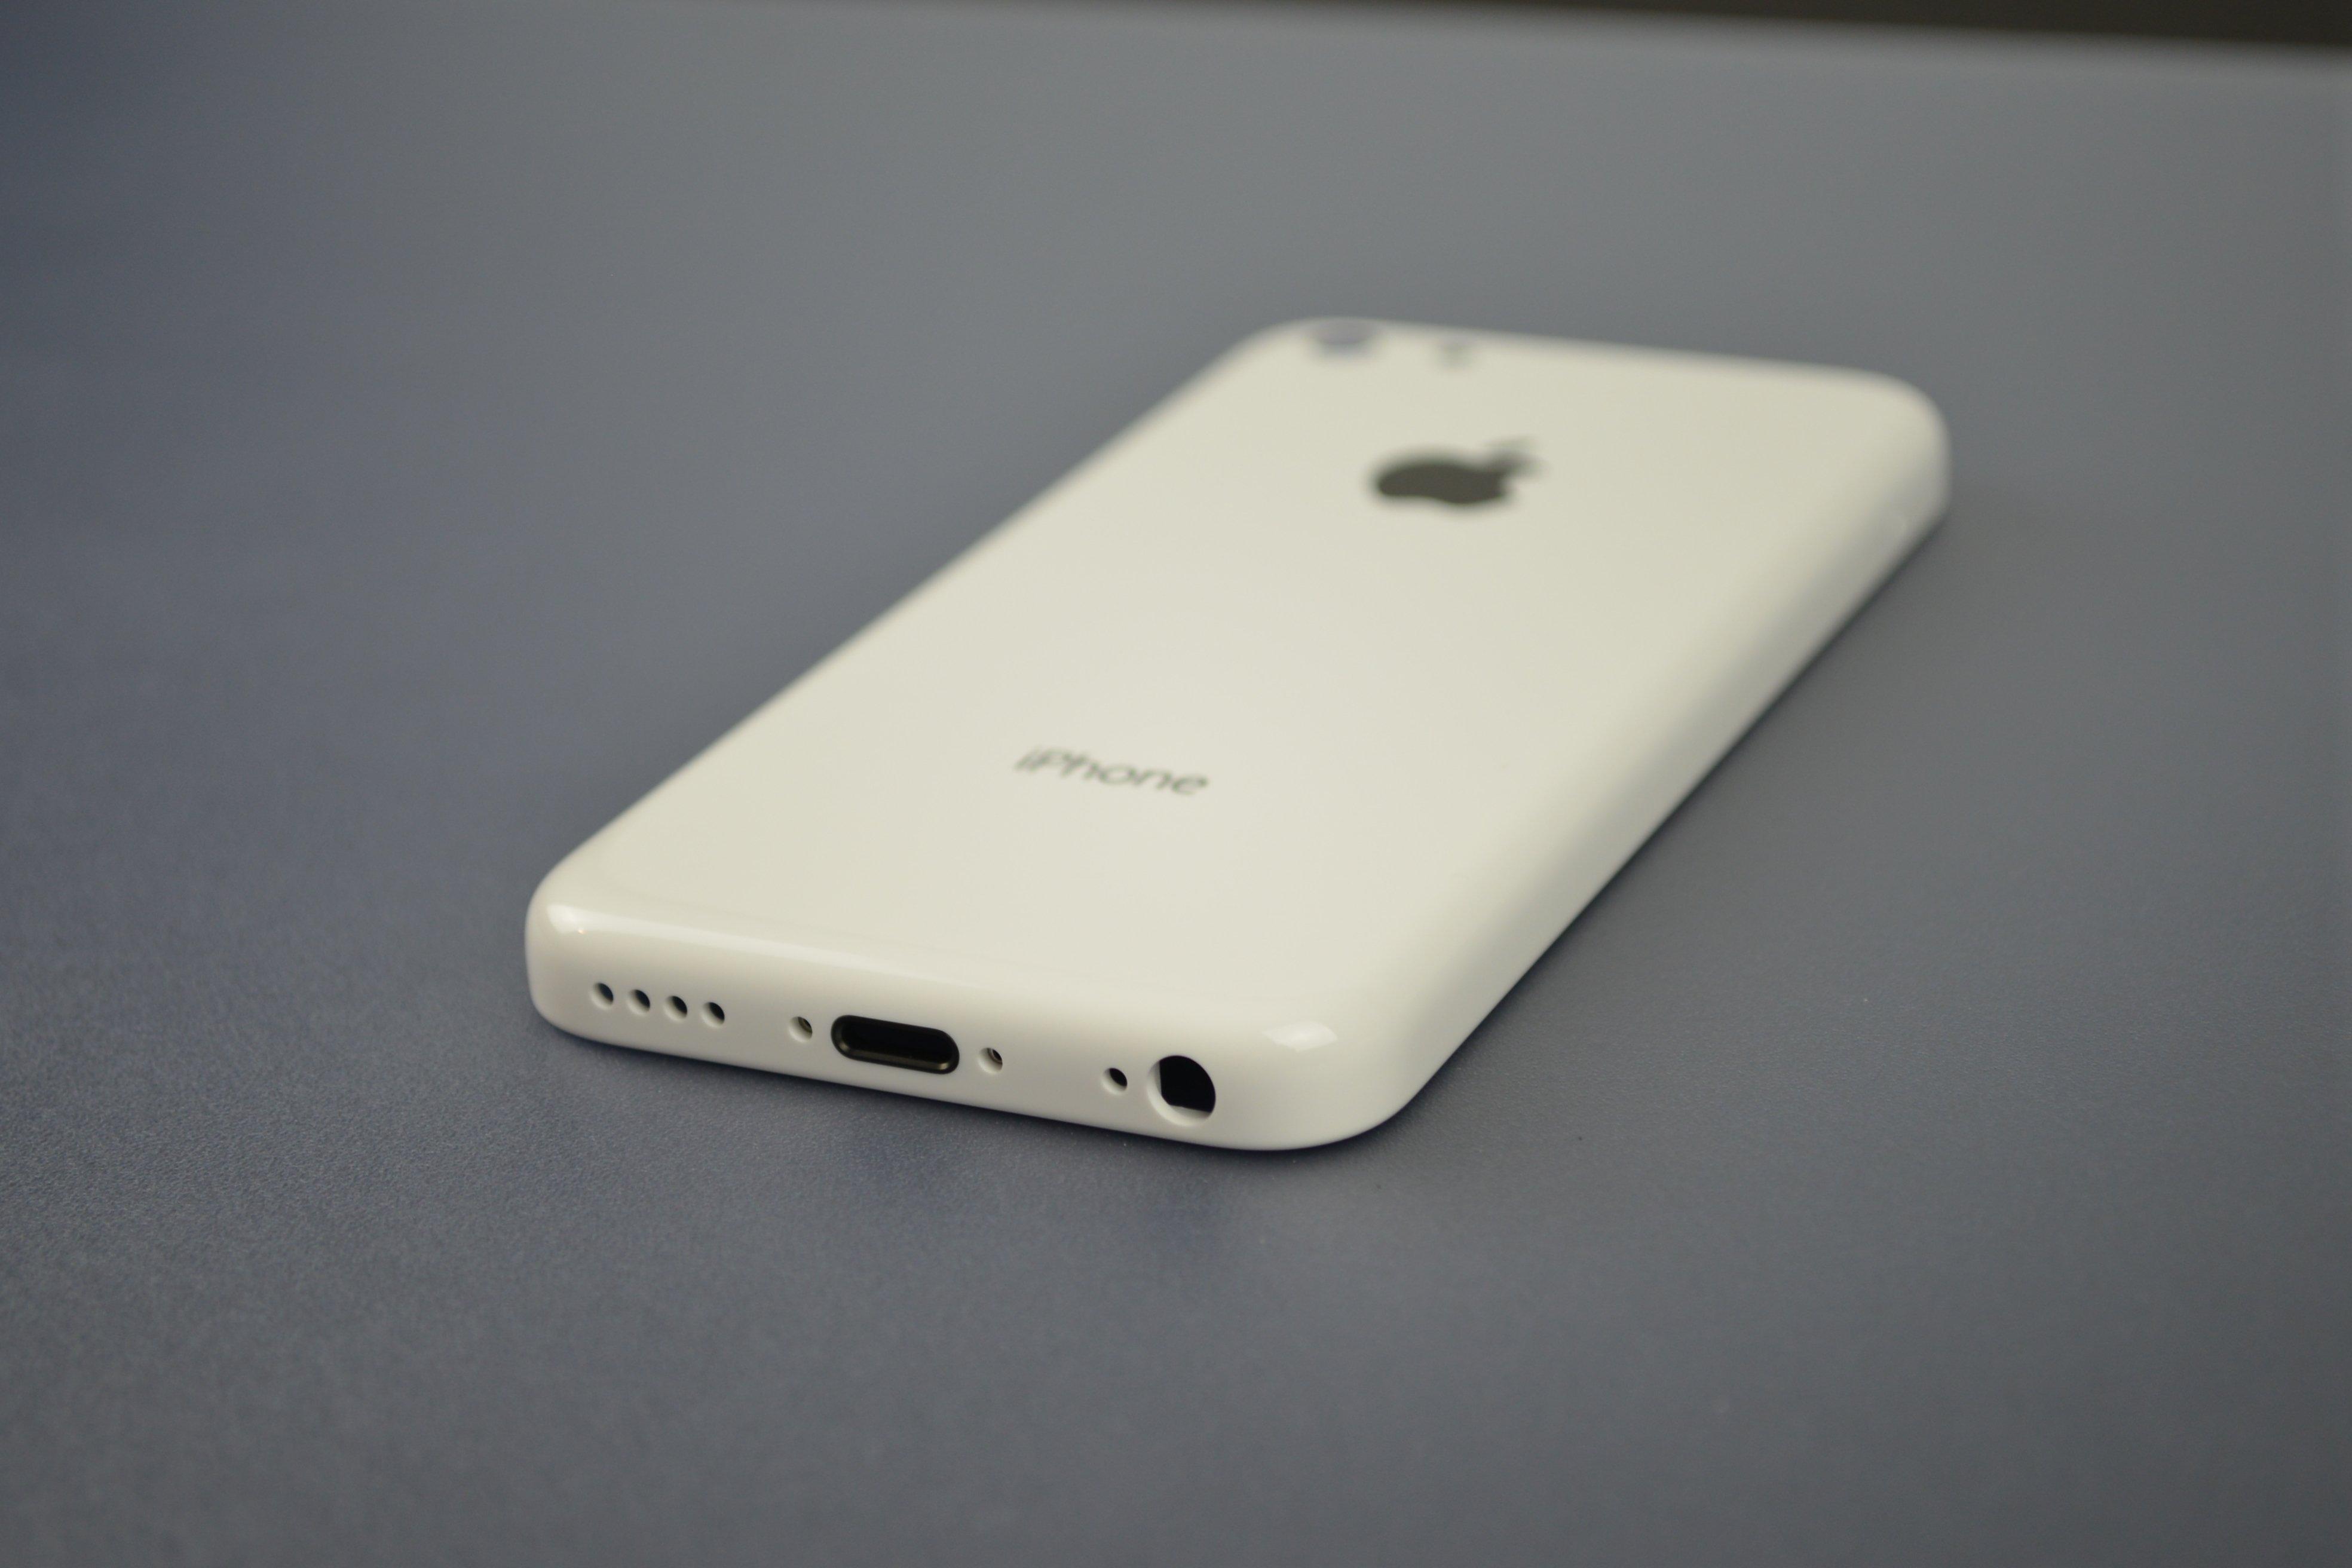 Apple Iphone 5c White